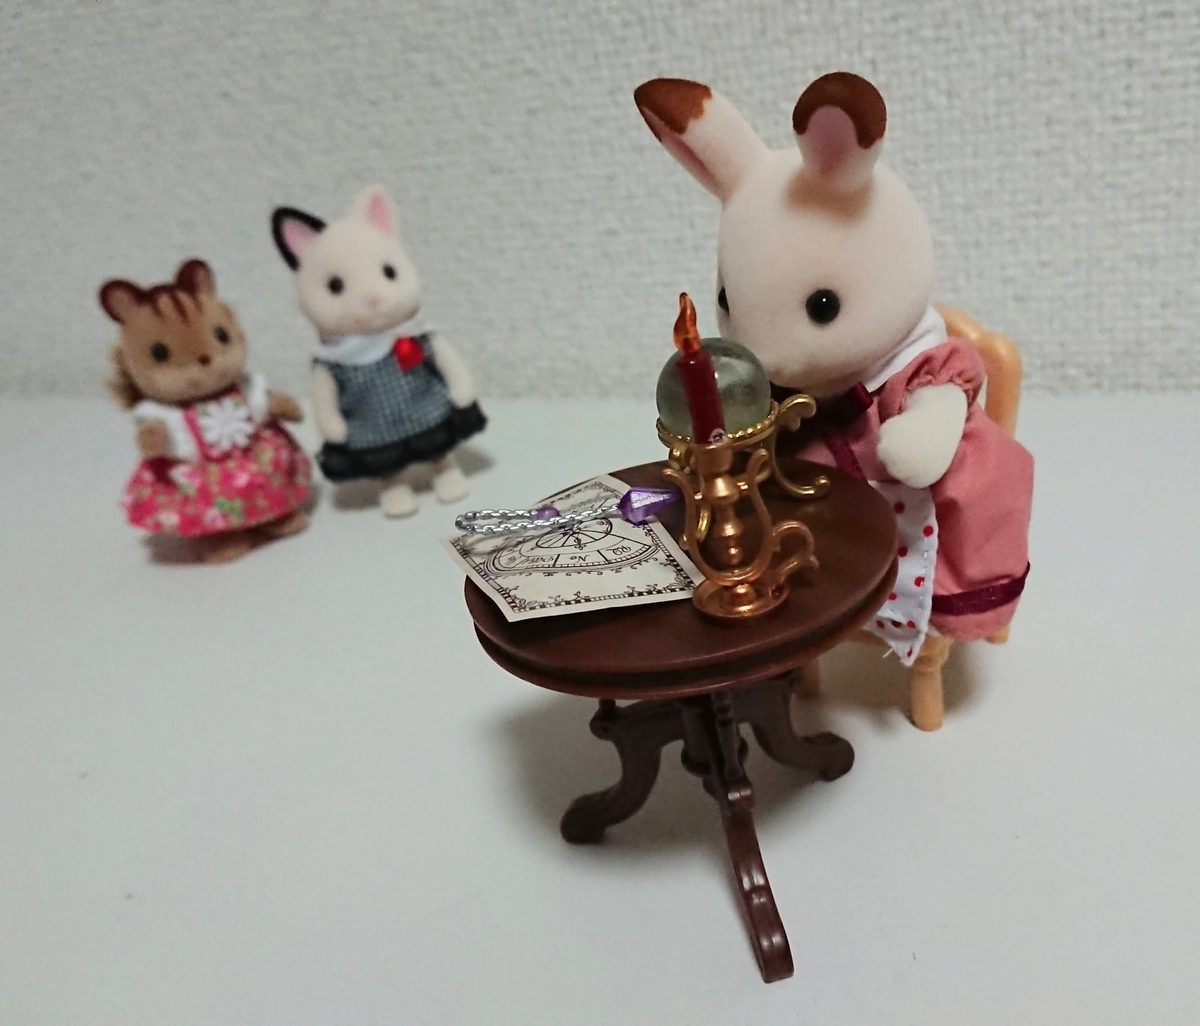 f:id:whileeating-milkchocolate:20210327174109j:plain